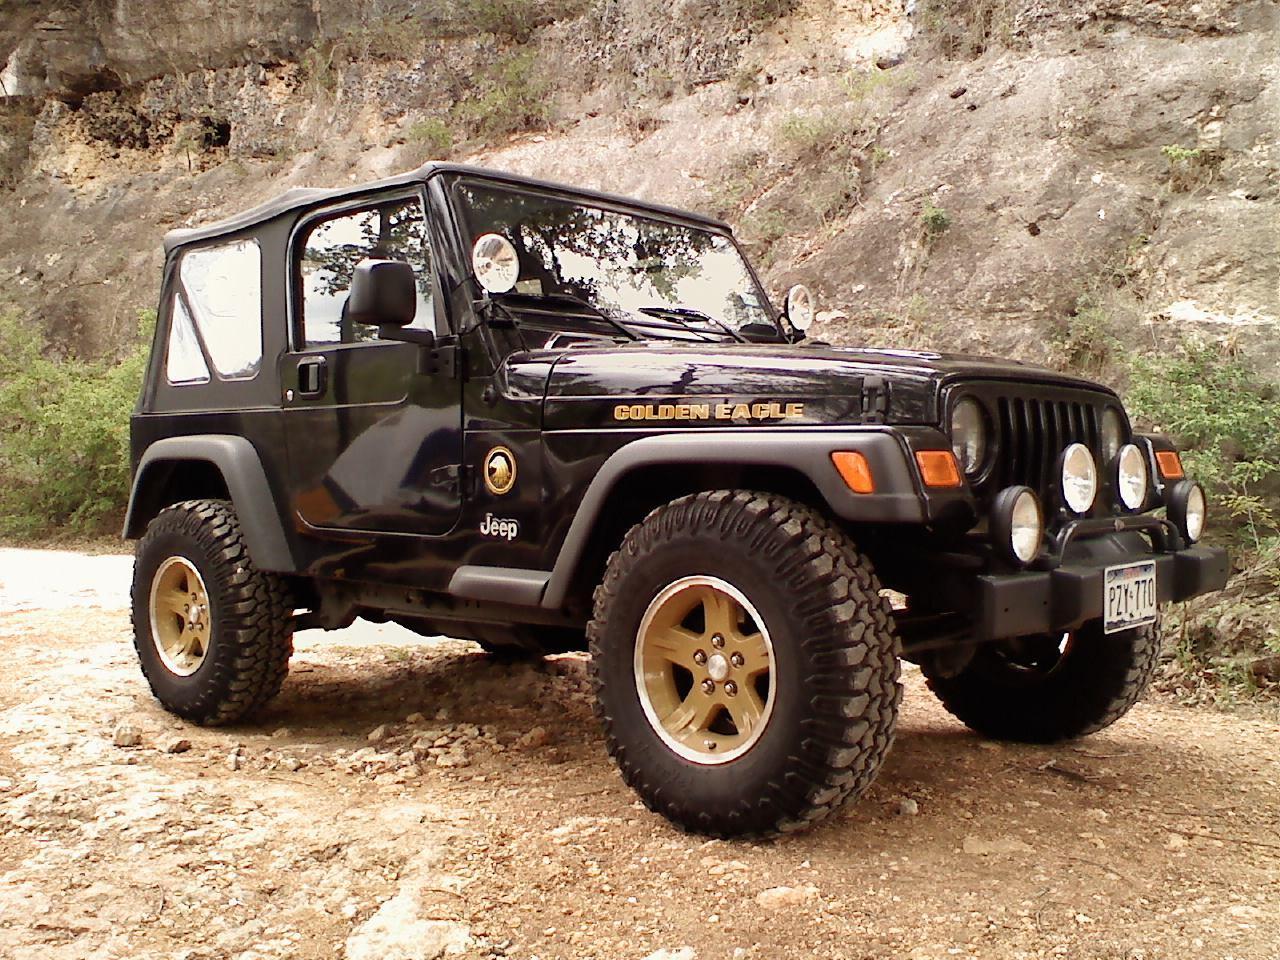 Exclusive Jeep Wrangler Golden Eagle 75th Anniversary